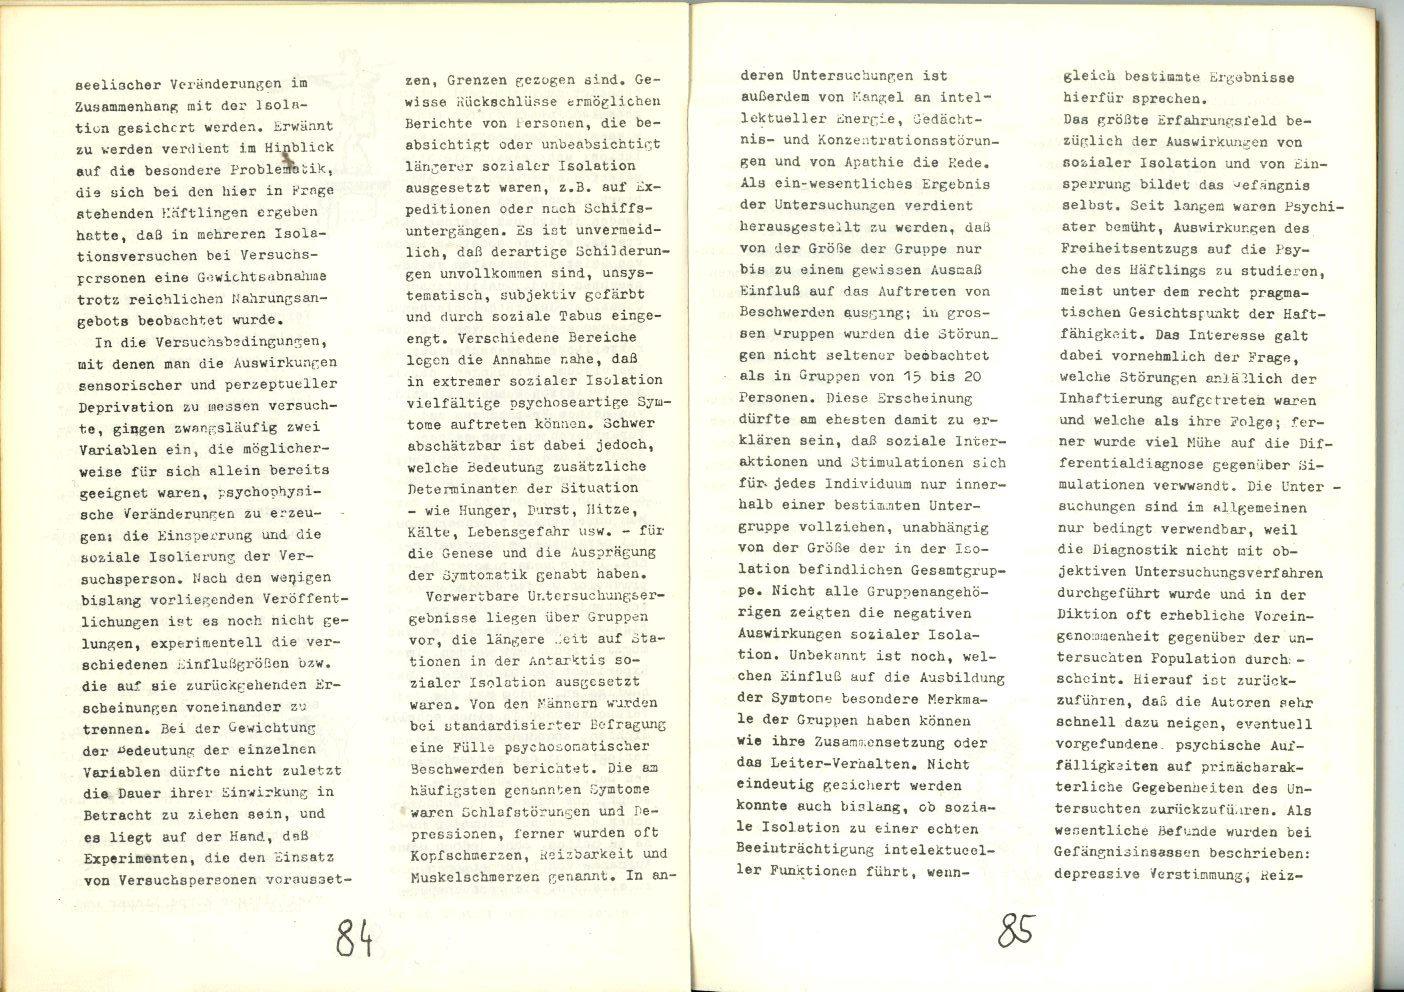 Marburg_Russell_Initiative_1978_44